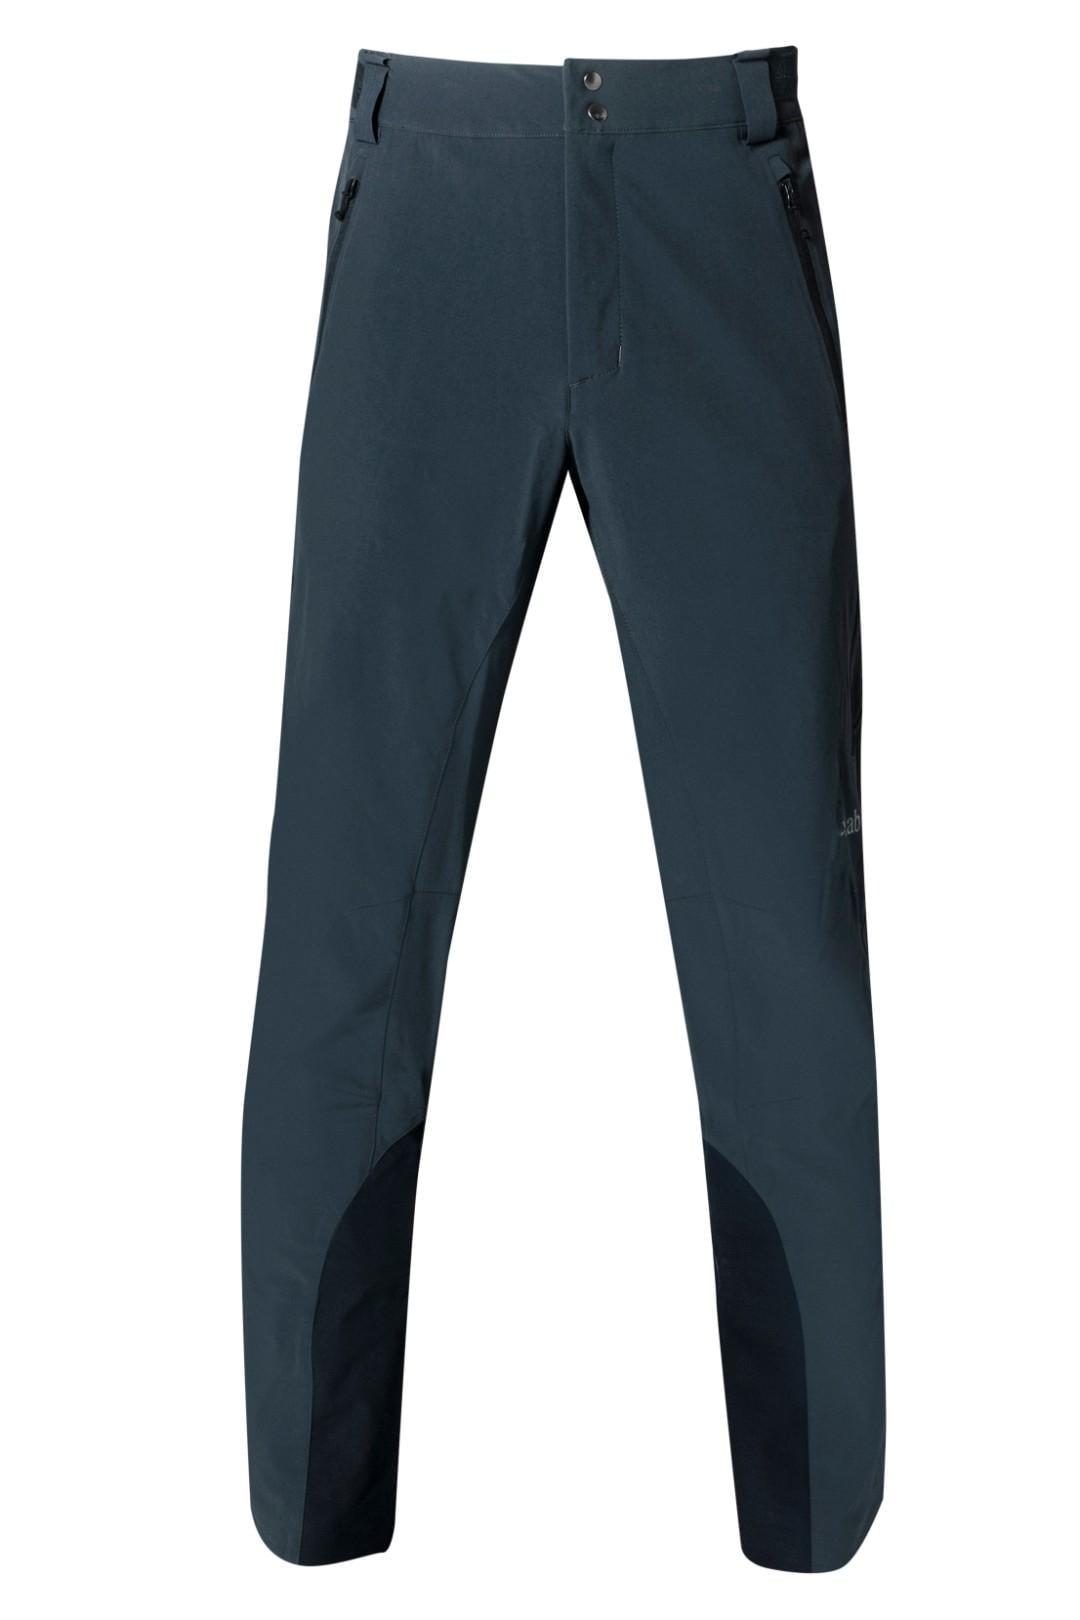 Rab Ascendor Pants M's